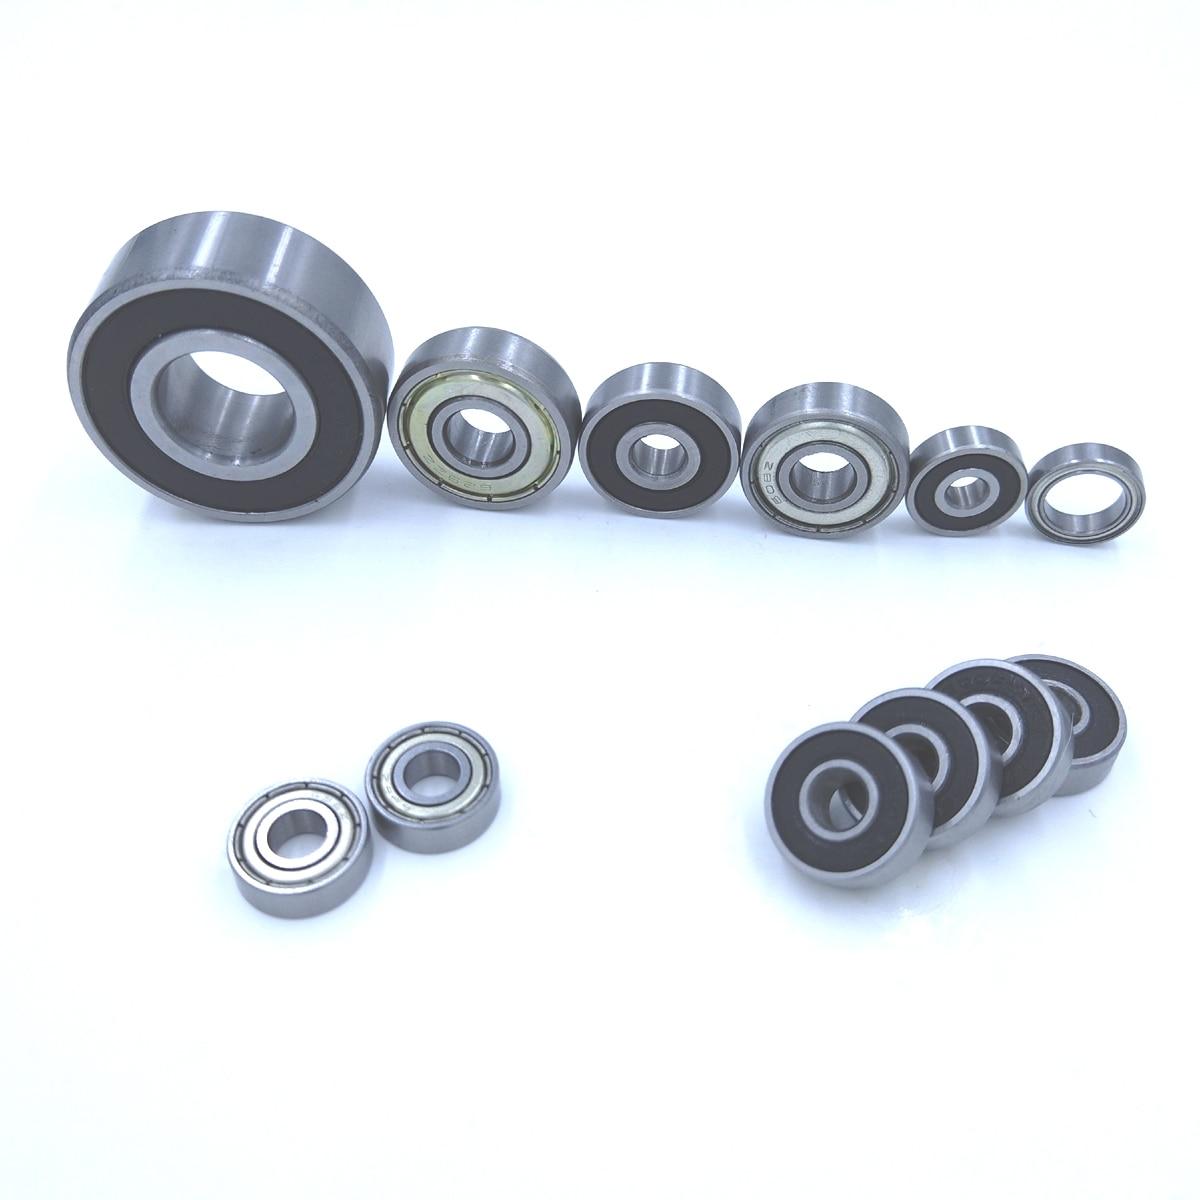 6202 6202ZZ 6202RS 6202-2Z 6202Z 6202-2RS ZZ RS RZ 2RZ Deep Groove Ball Bearings 15 x 35 x 11mm